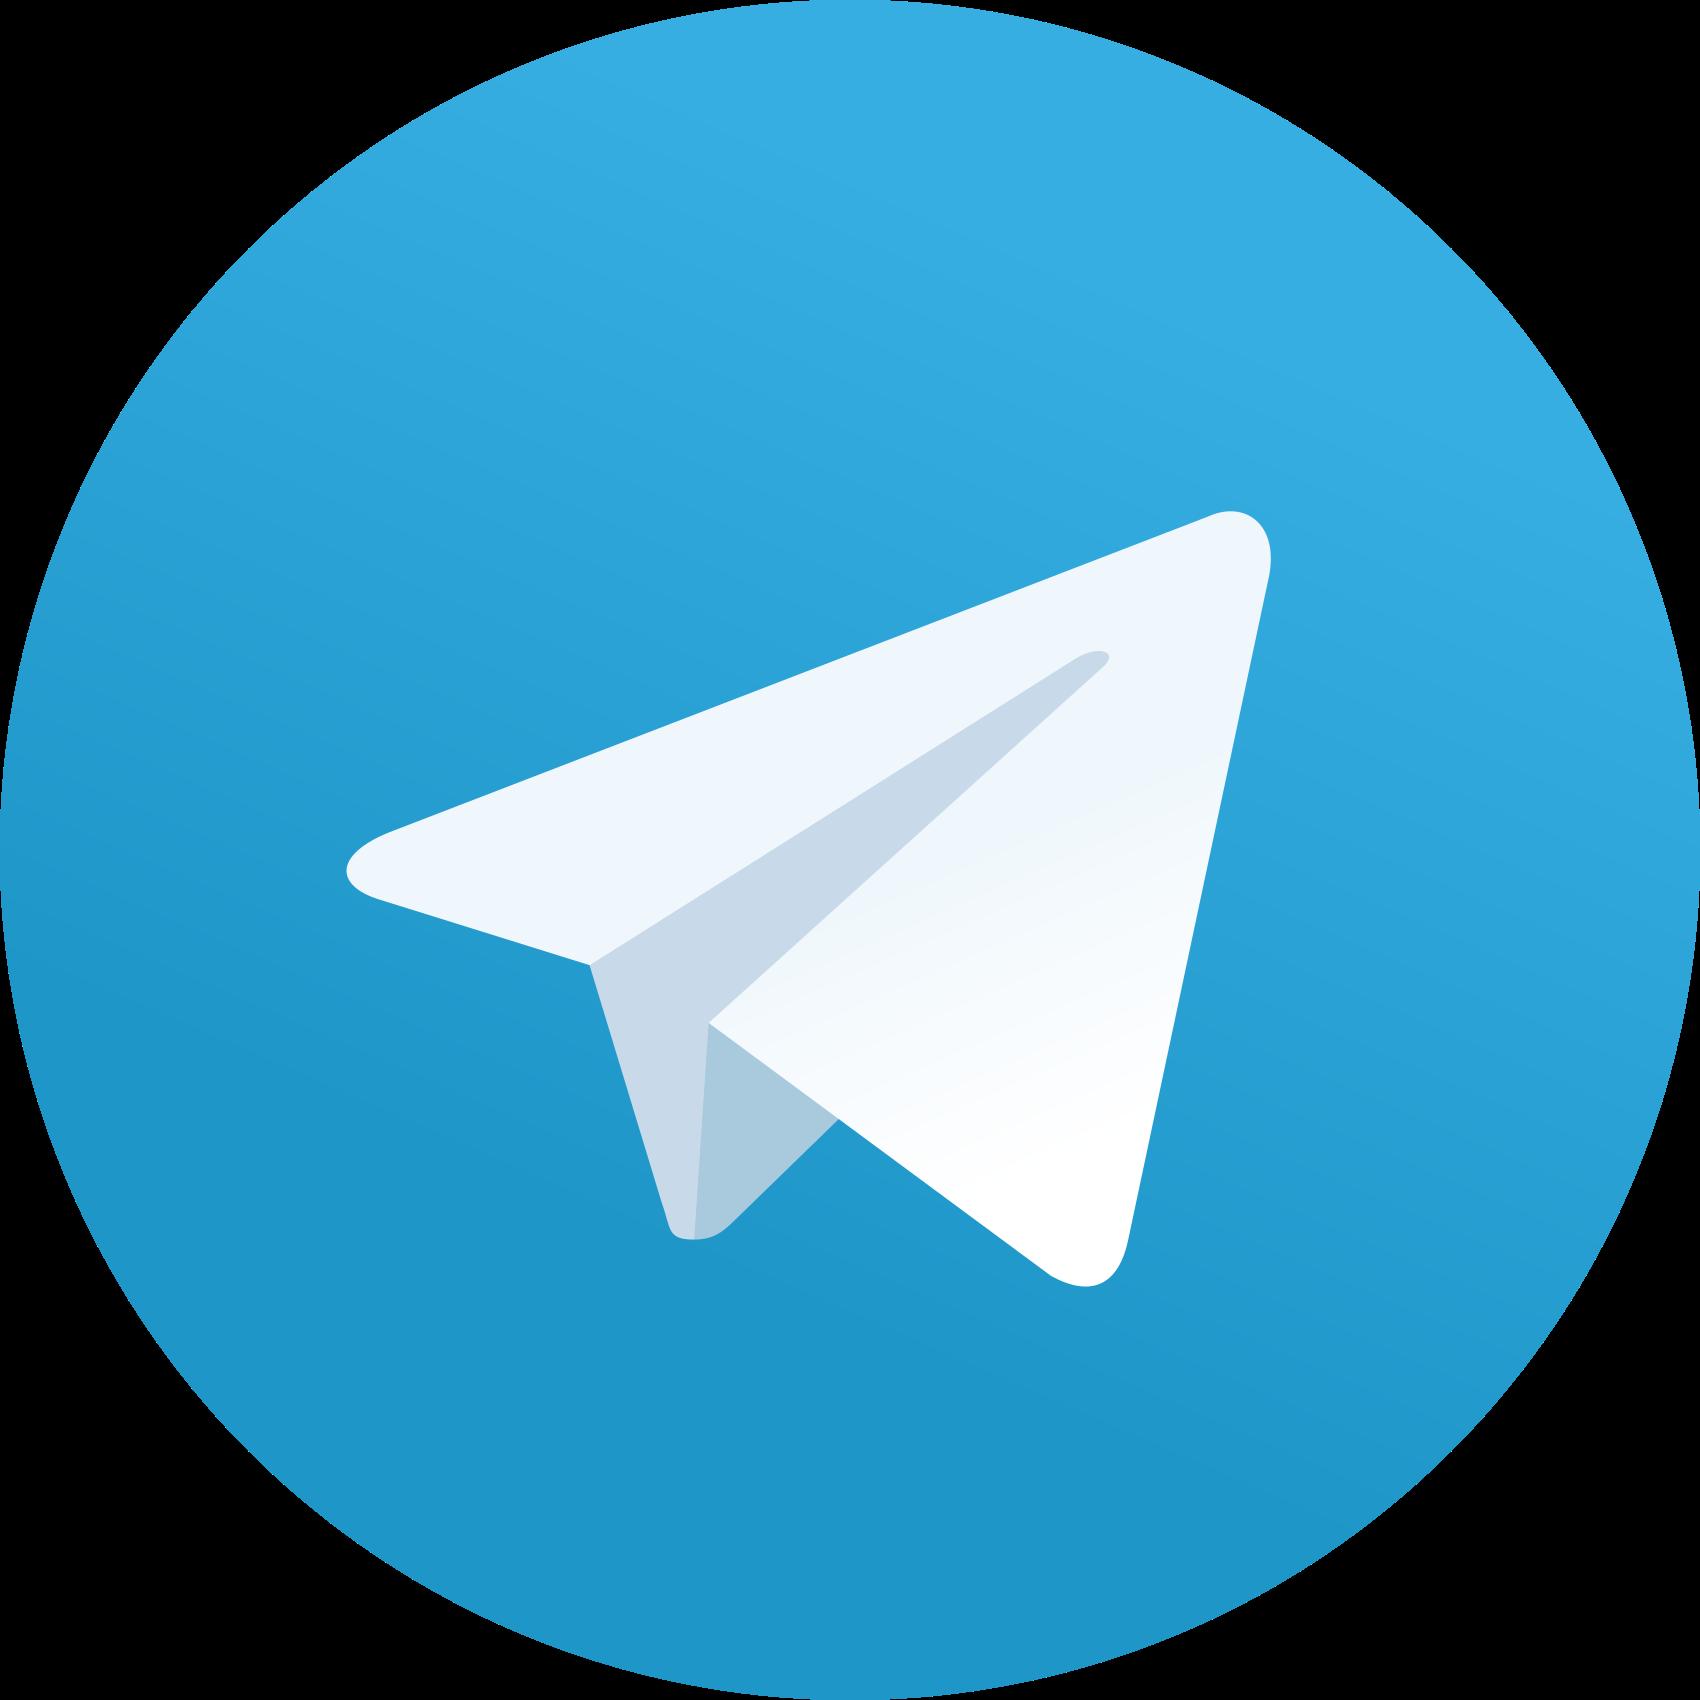 telegram-icone-icon-2